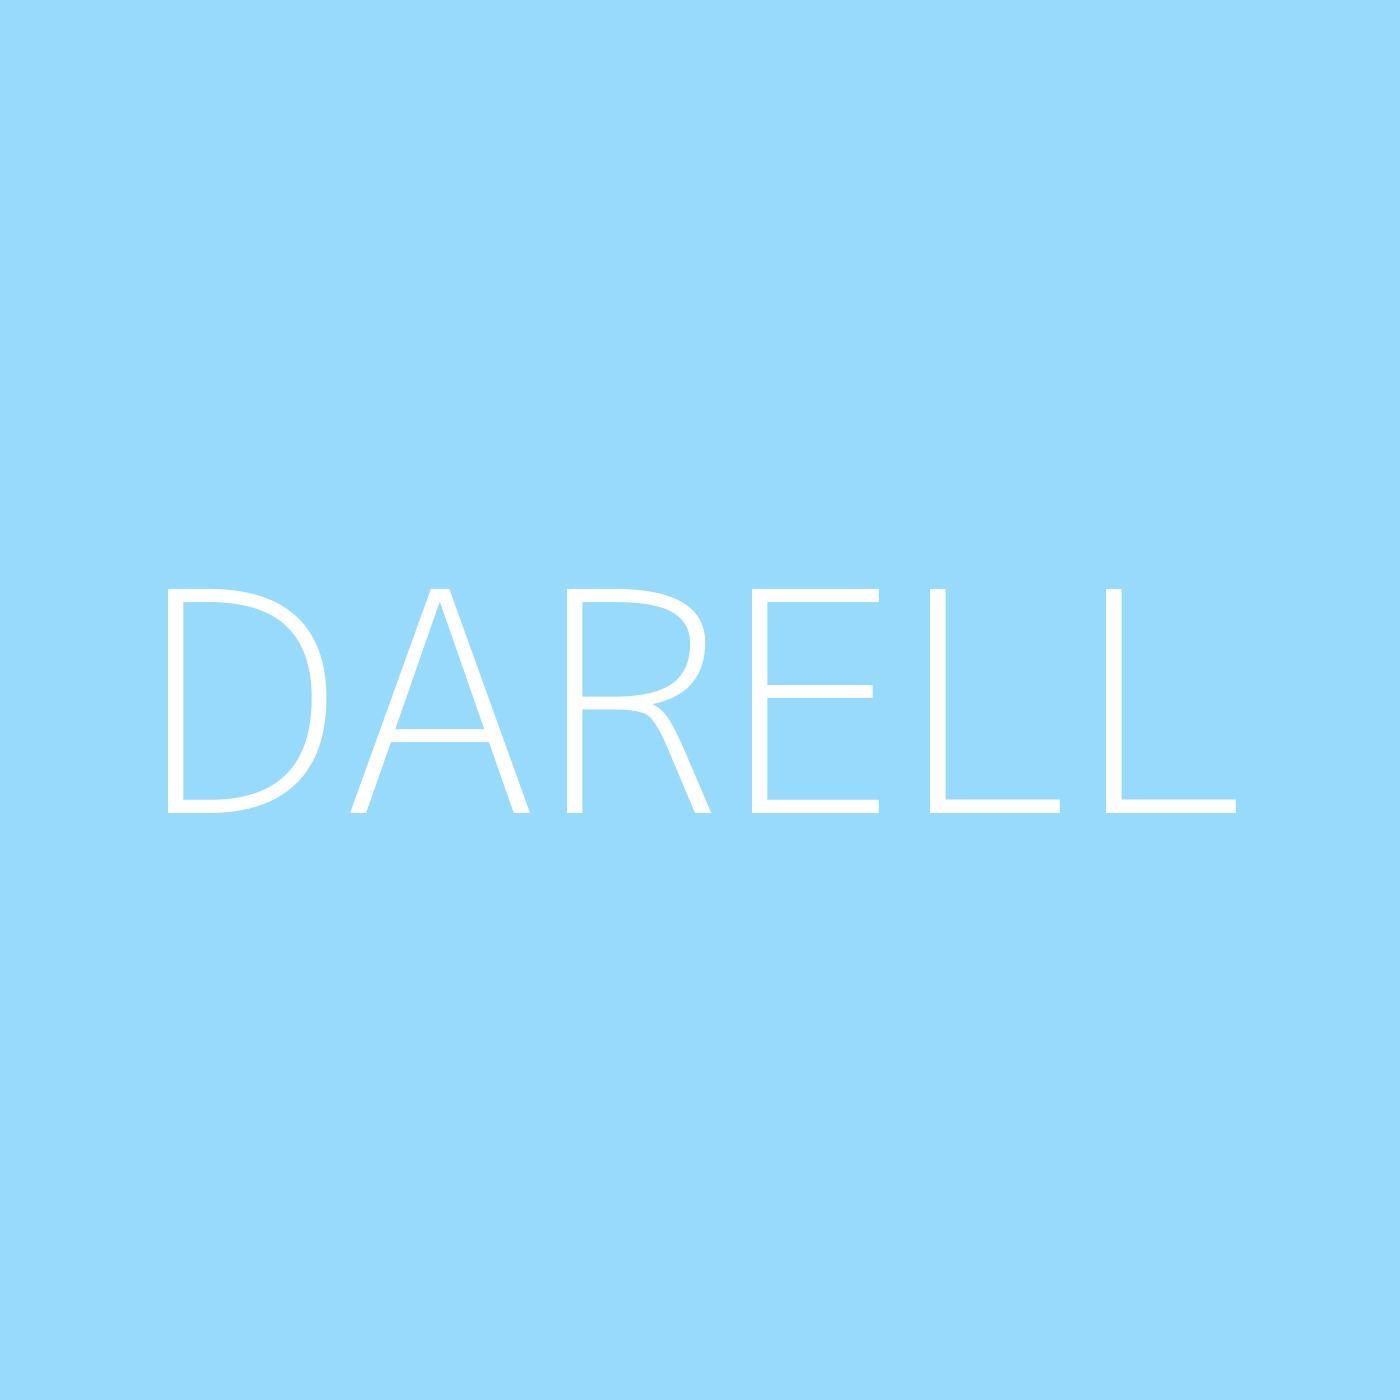 Darell Playlist Artwork